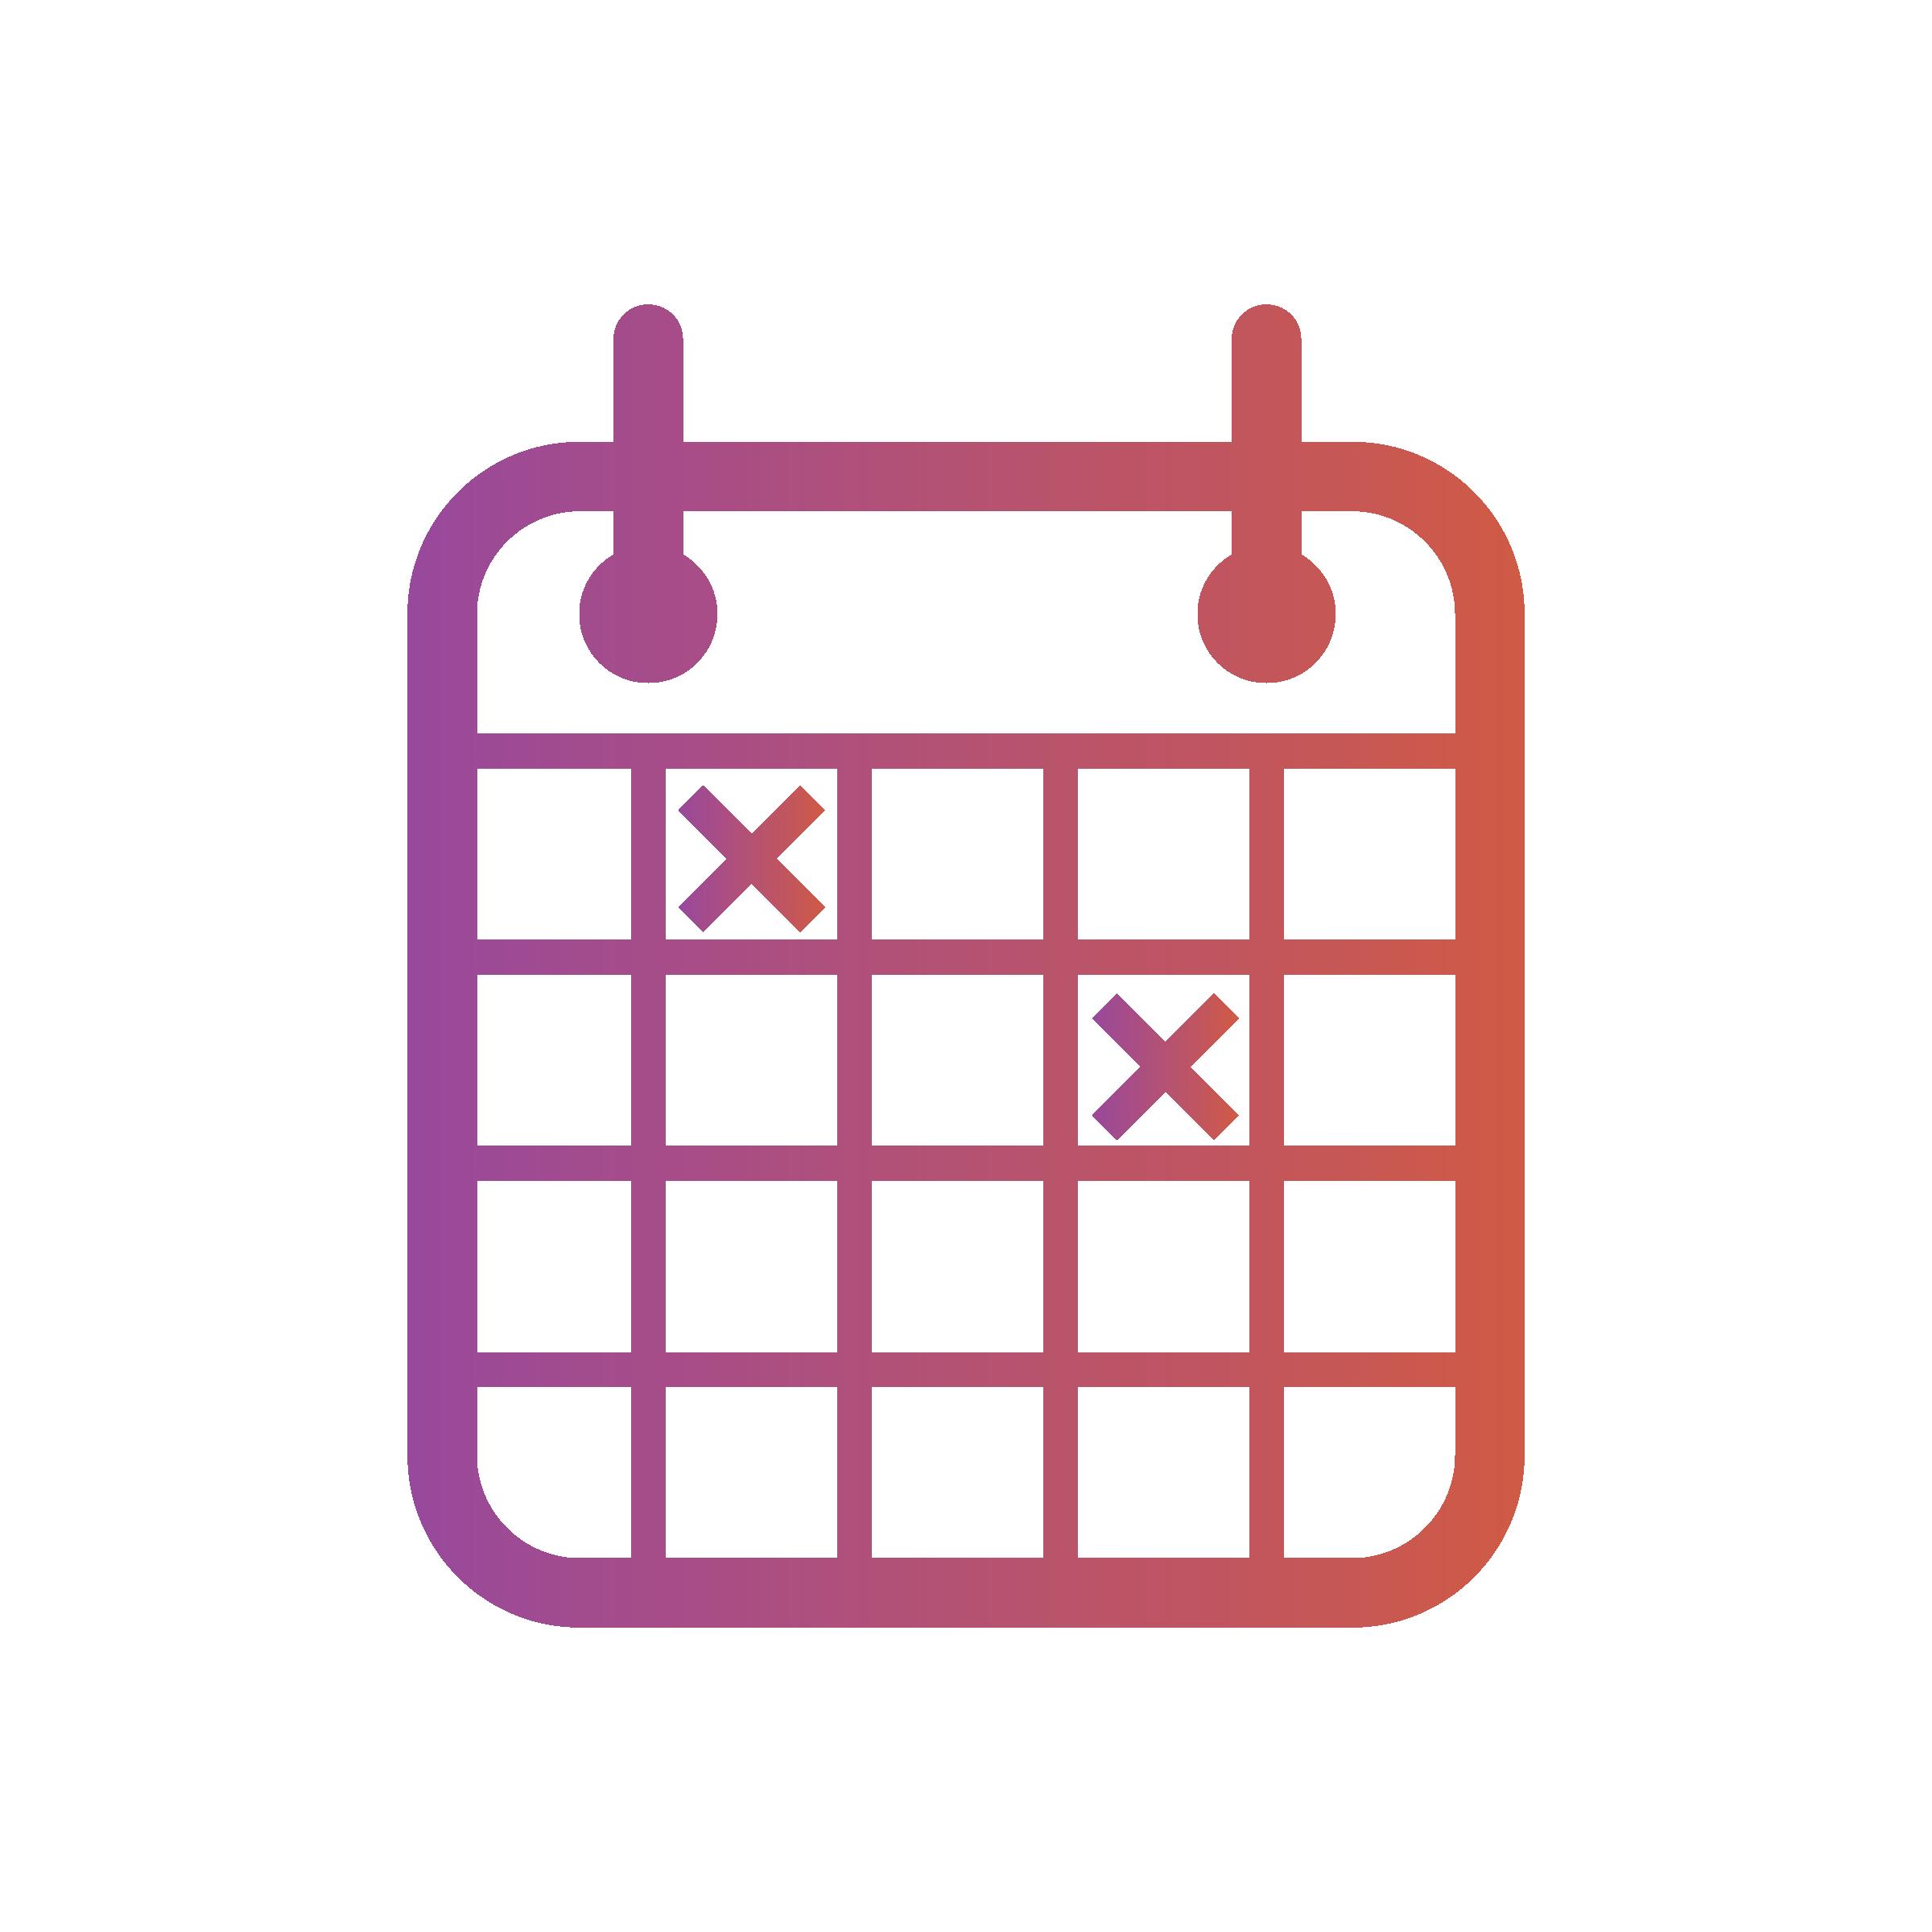 calendar p-r-01.png